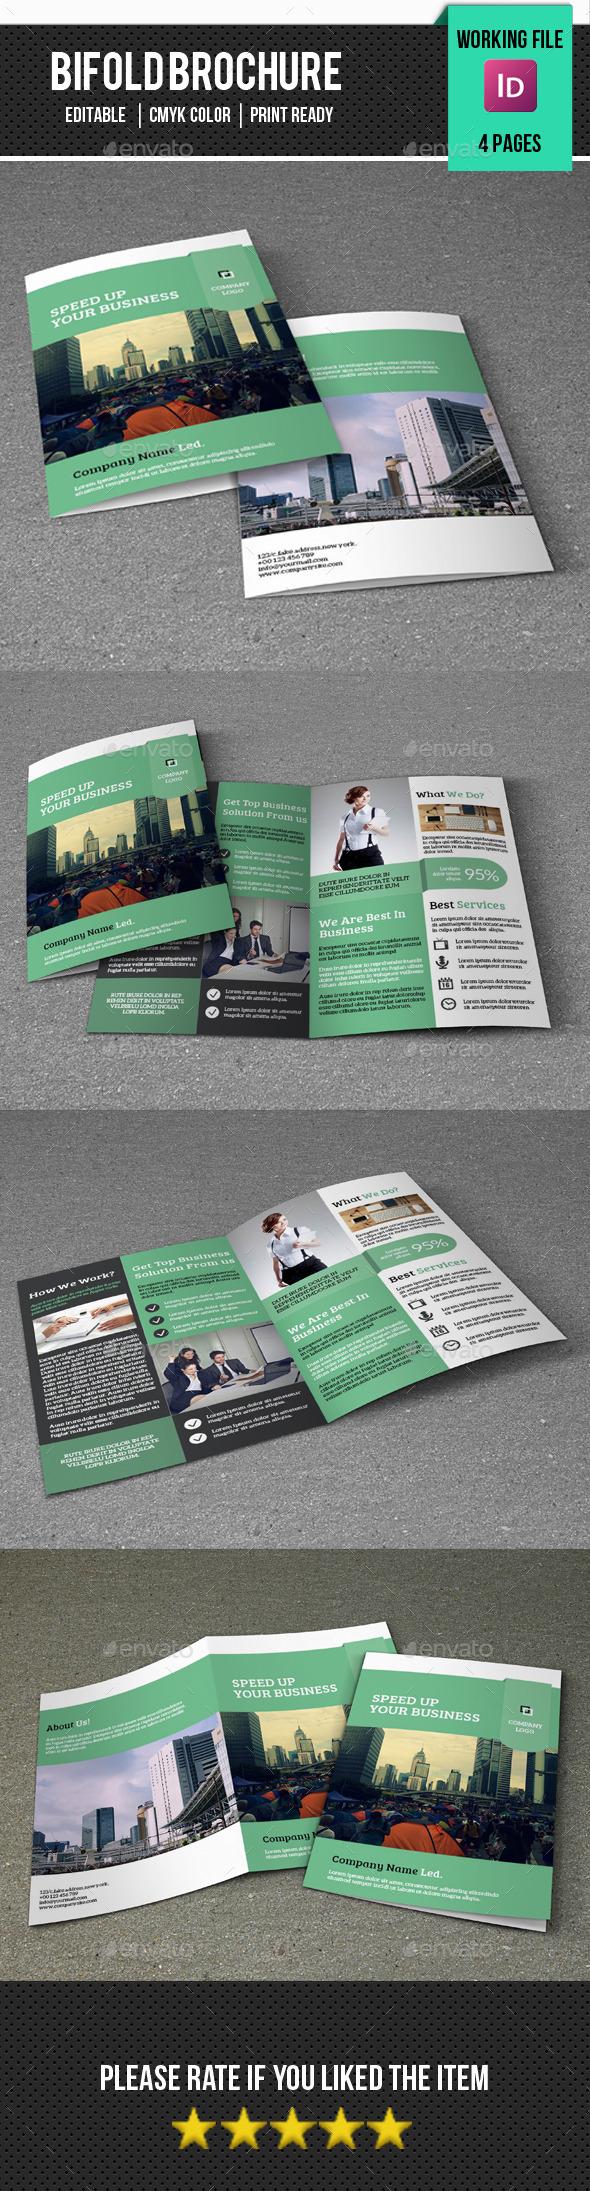 Corporate Brochure Template-V287 - Corporate Brochures